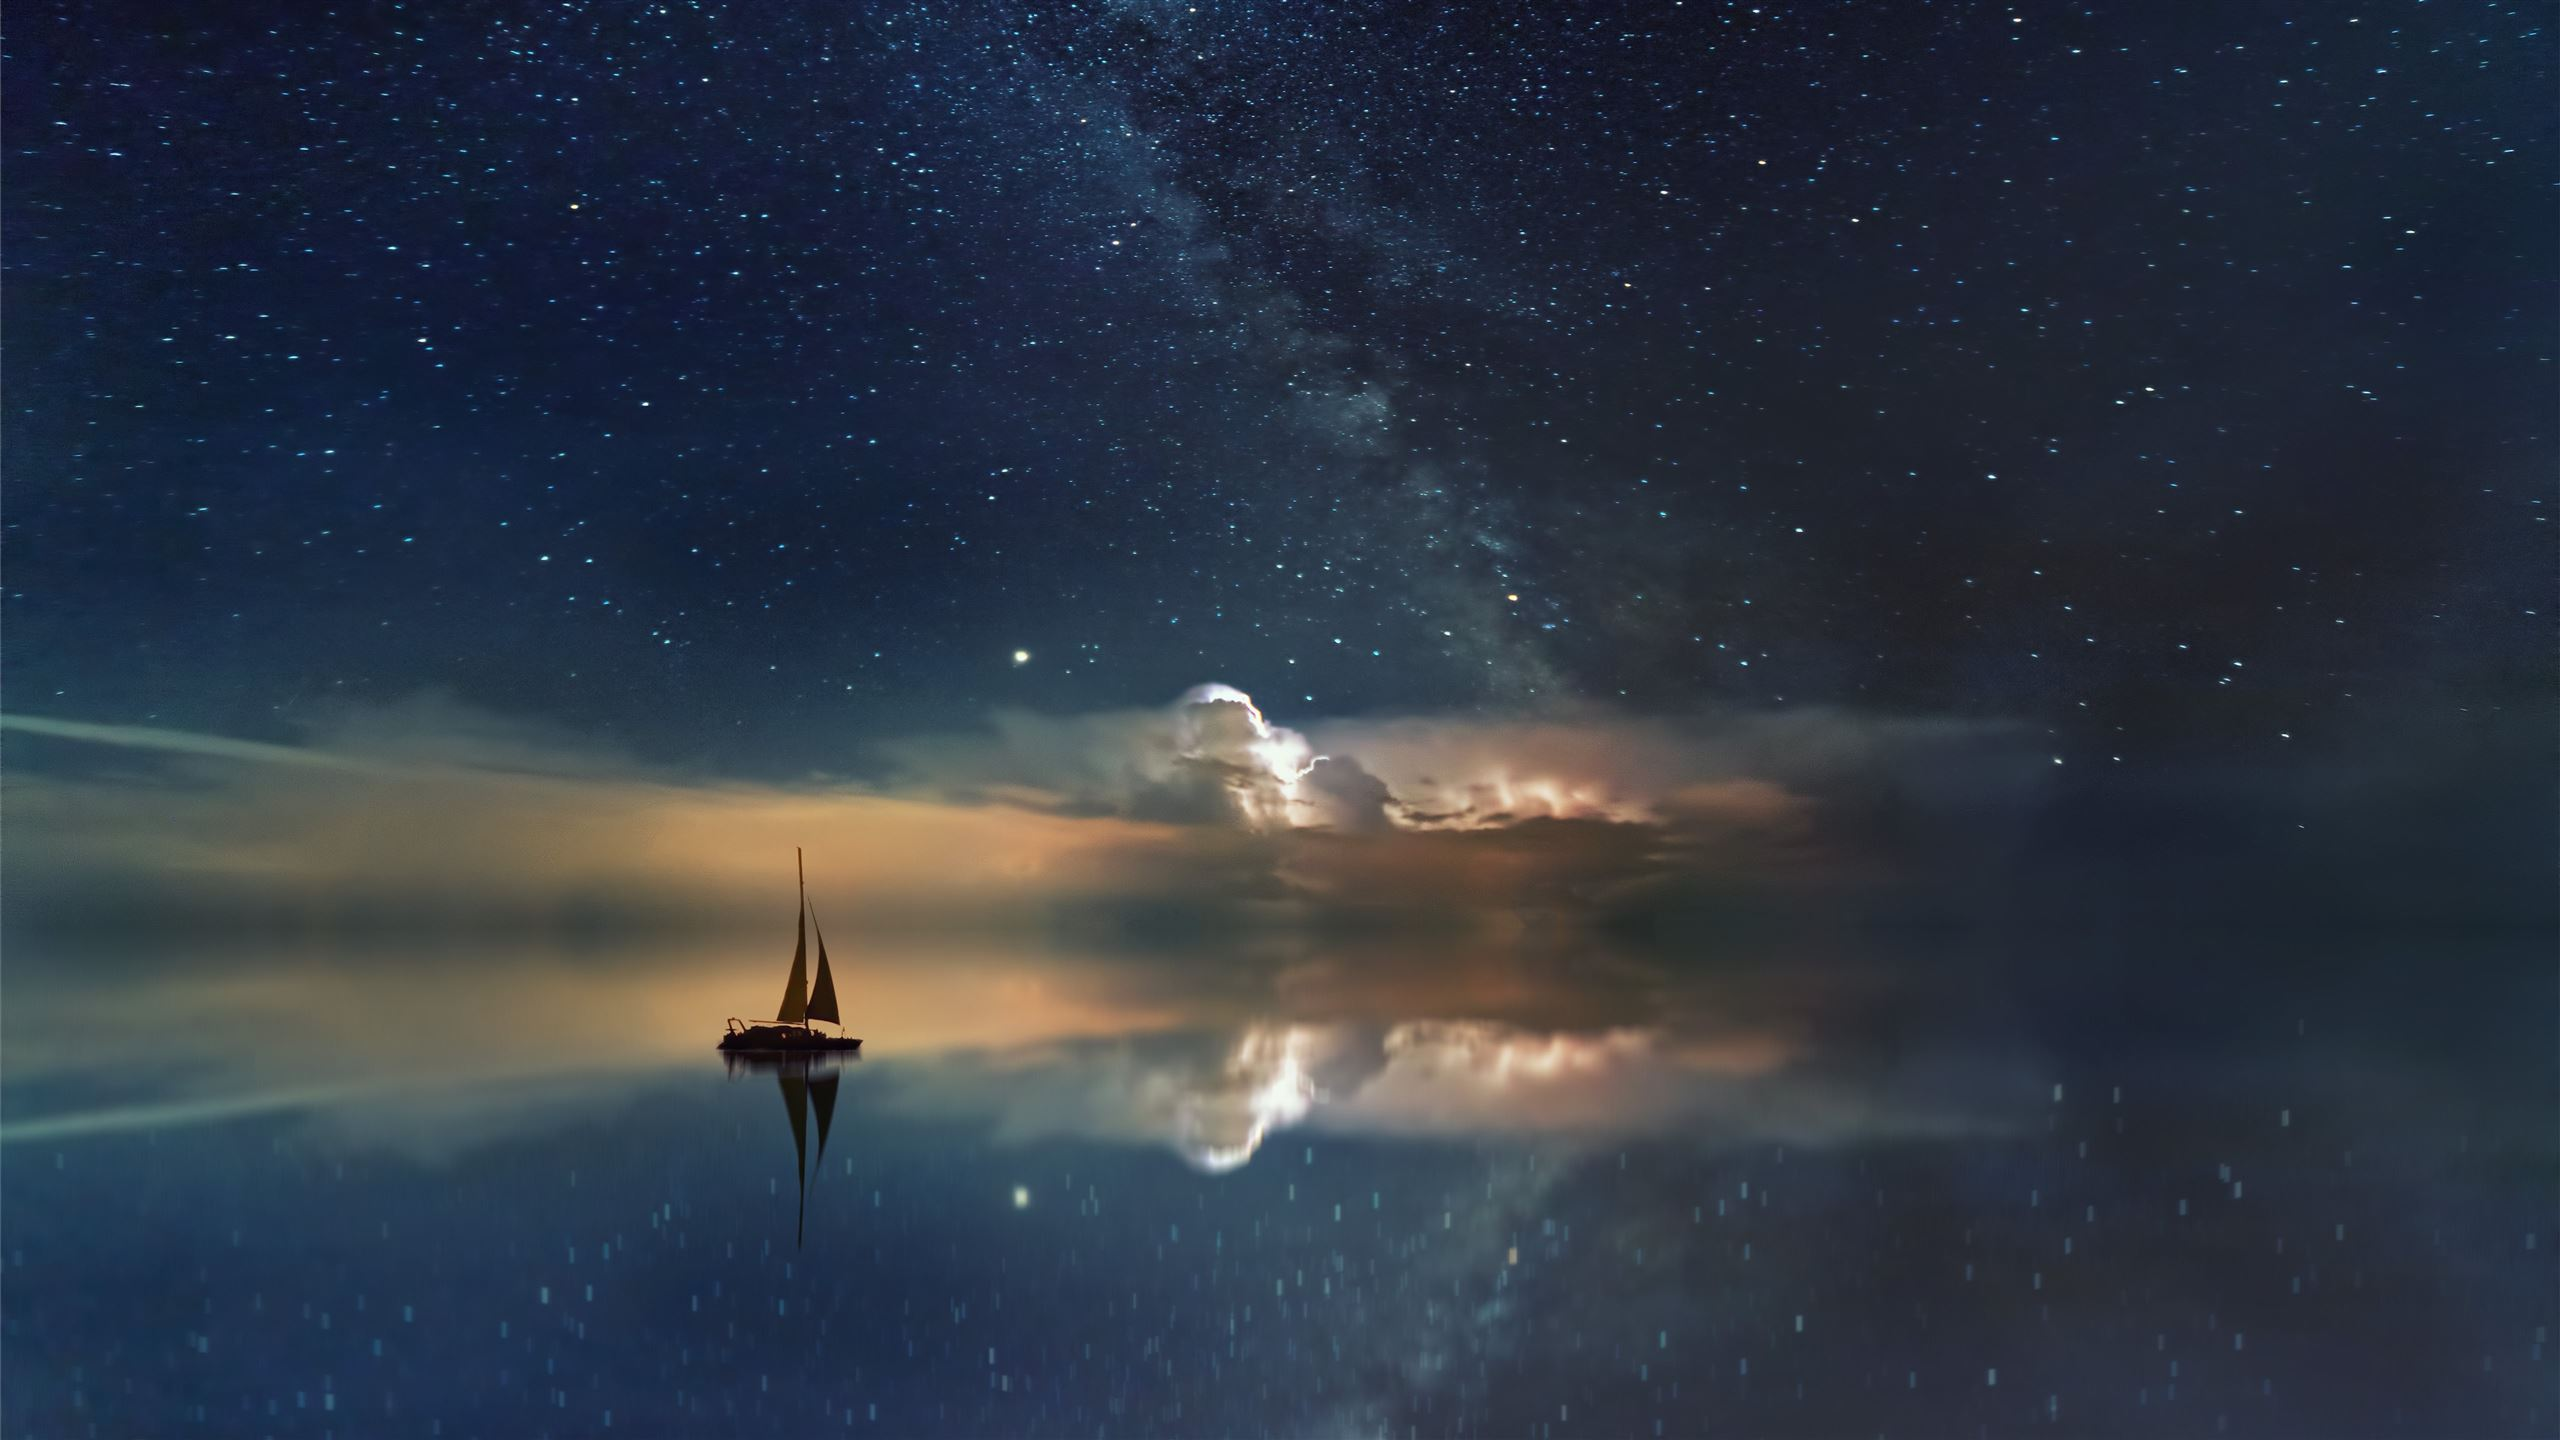 Black Sailing Boat Digital Wallpaper Imac Wallpaper Download Allmacwallpaper